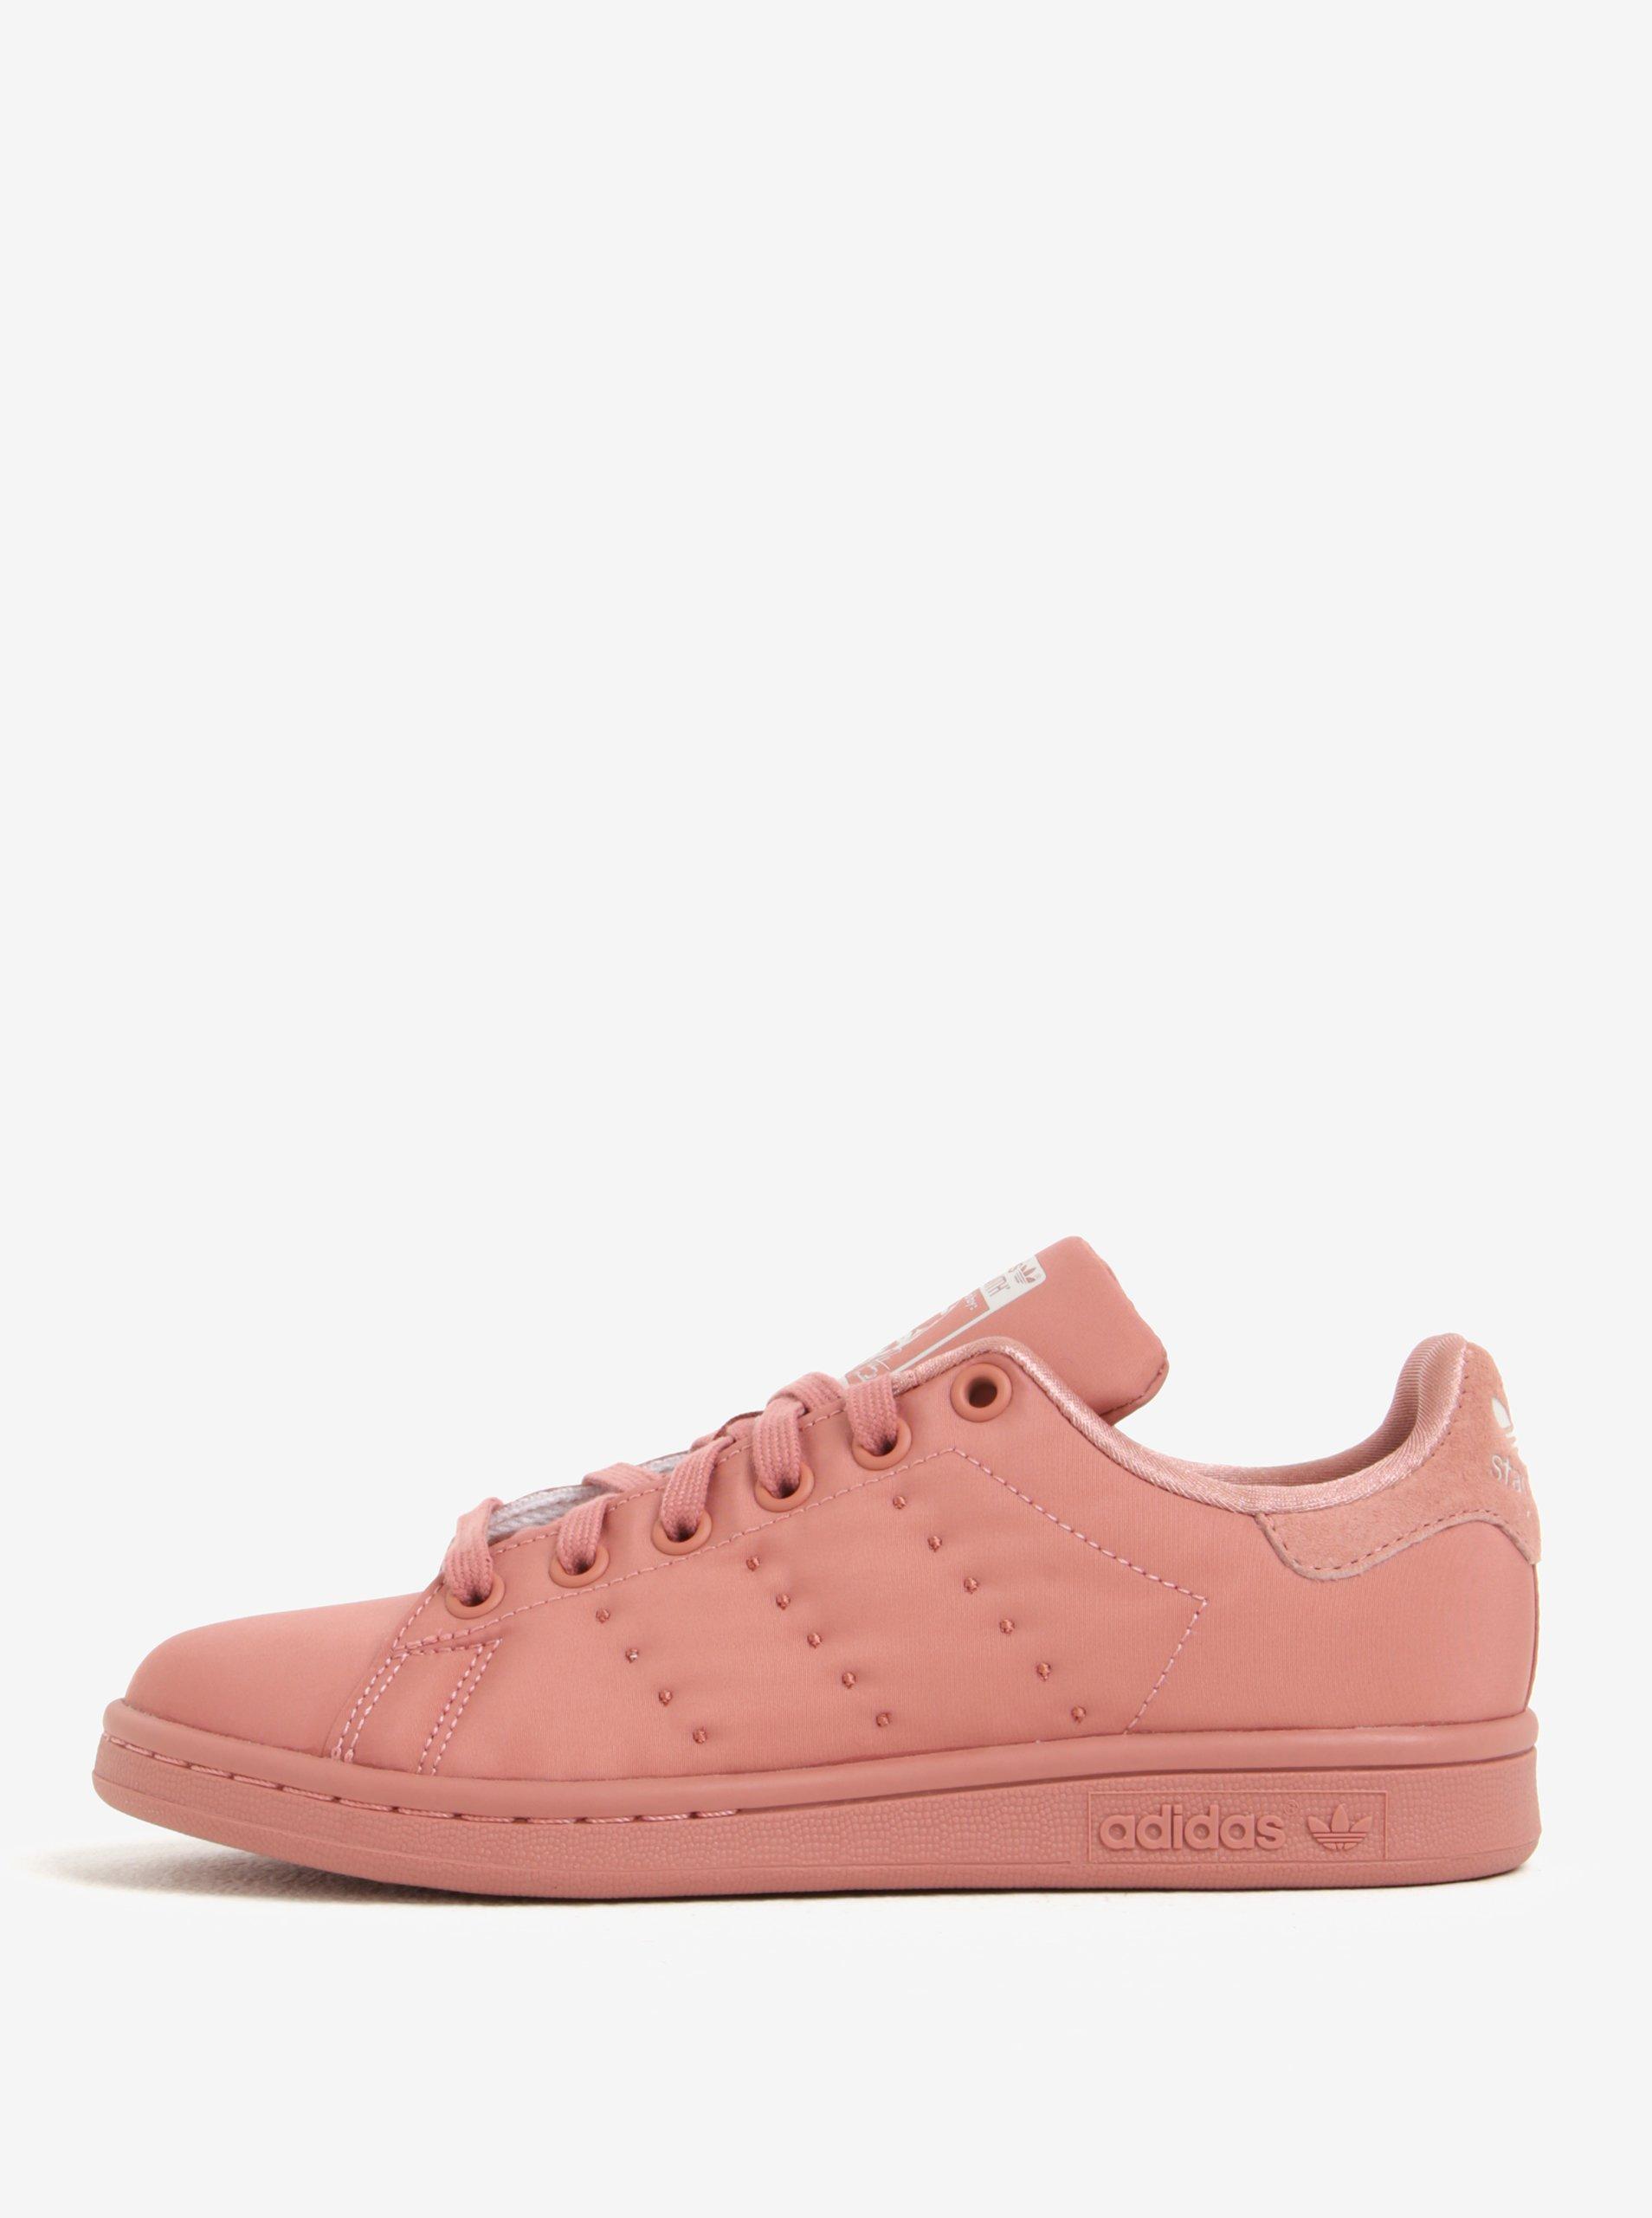 Růžové dámské tenisky adidas Originals Stan Smith